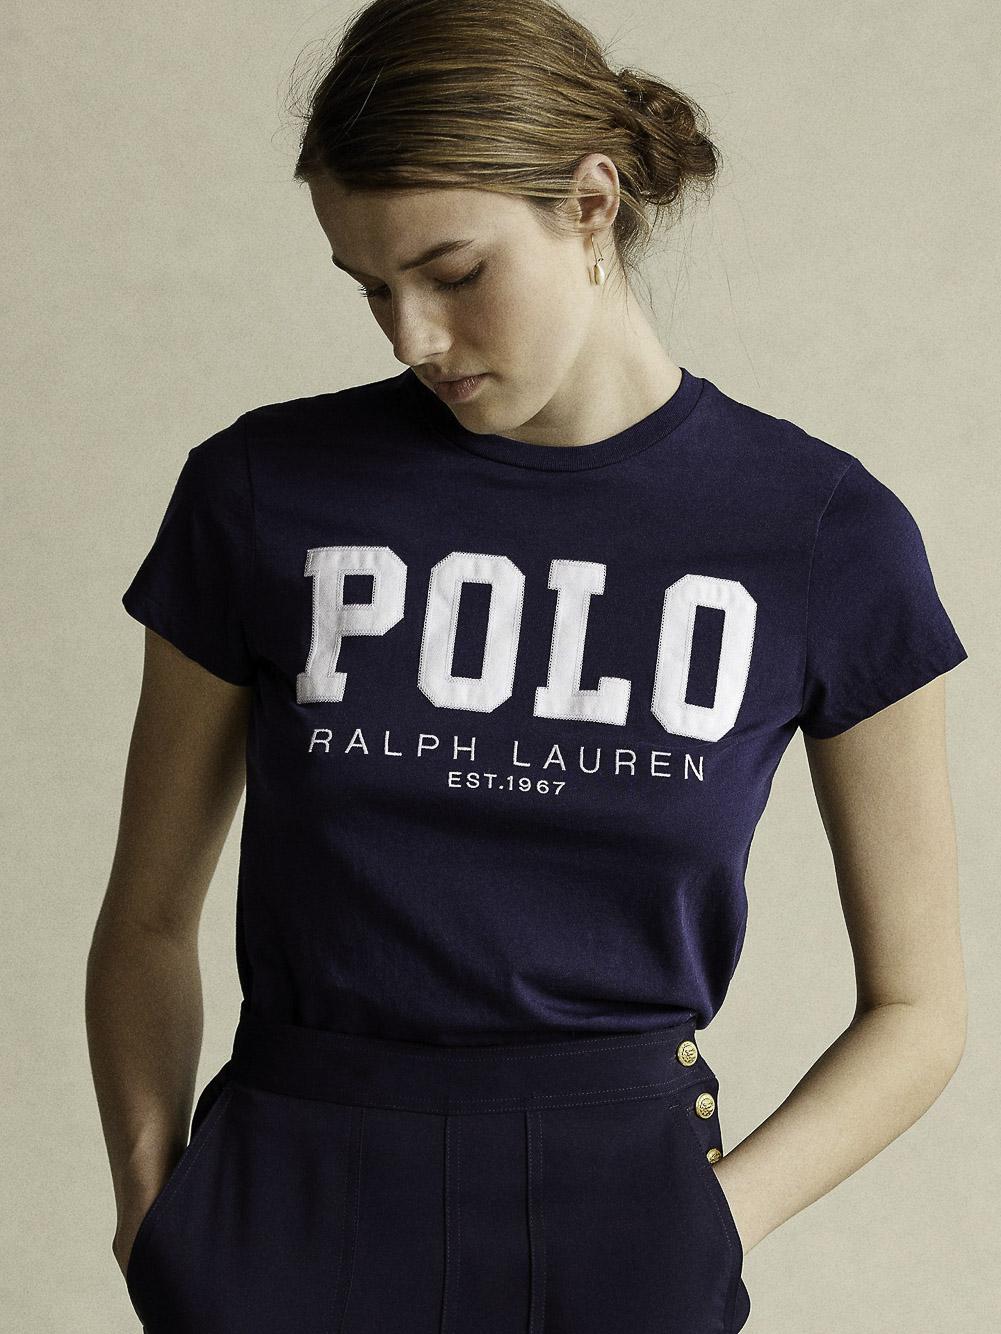 POLO RALPH LAUREN Μπλούζα T-Shirt 211827660002 ΜΠΛΕ